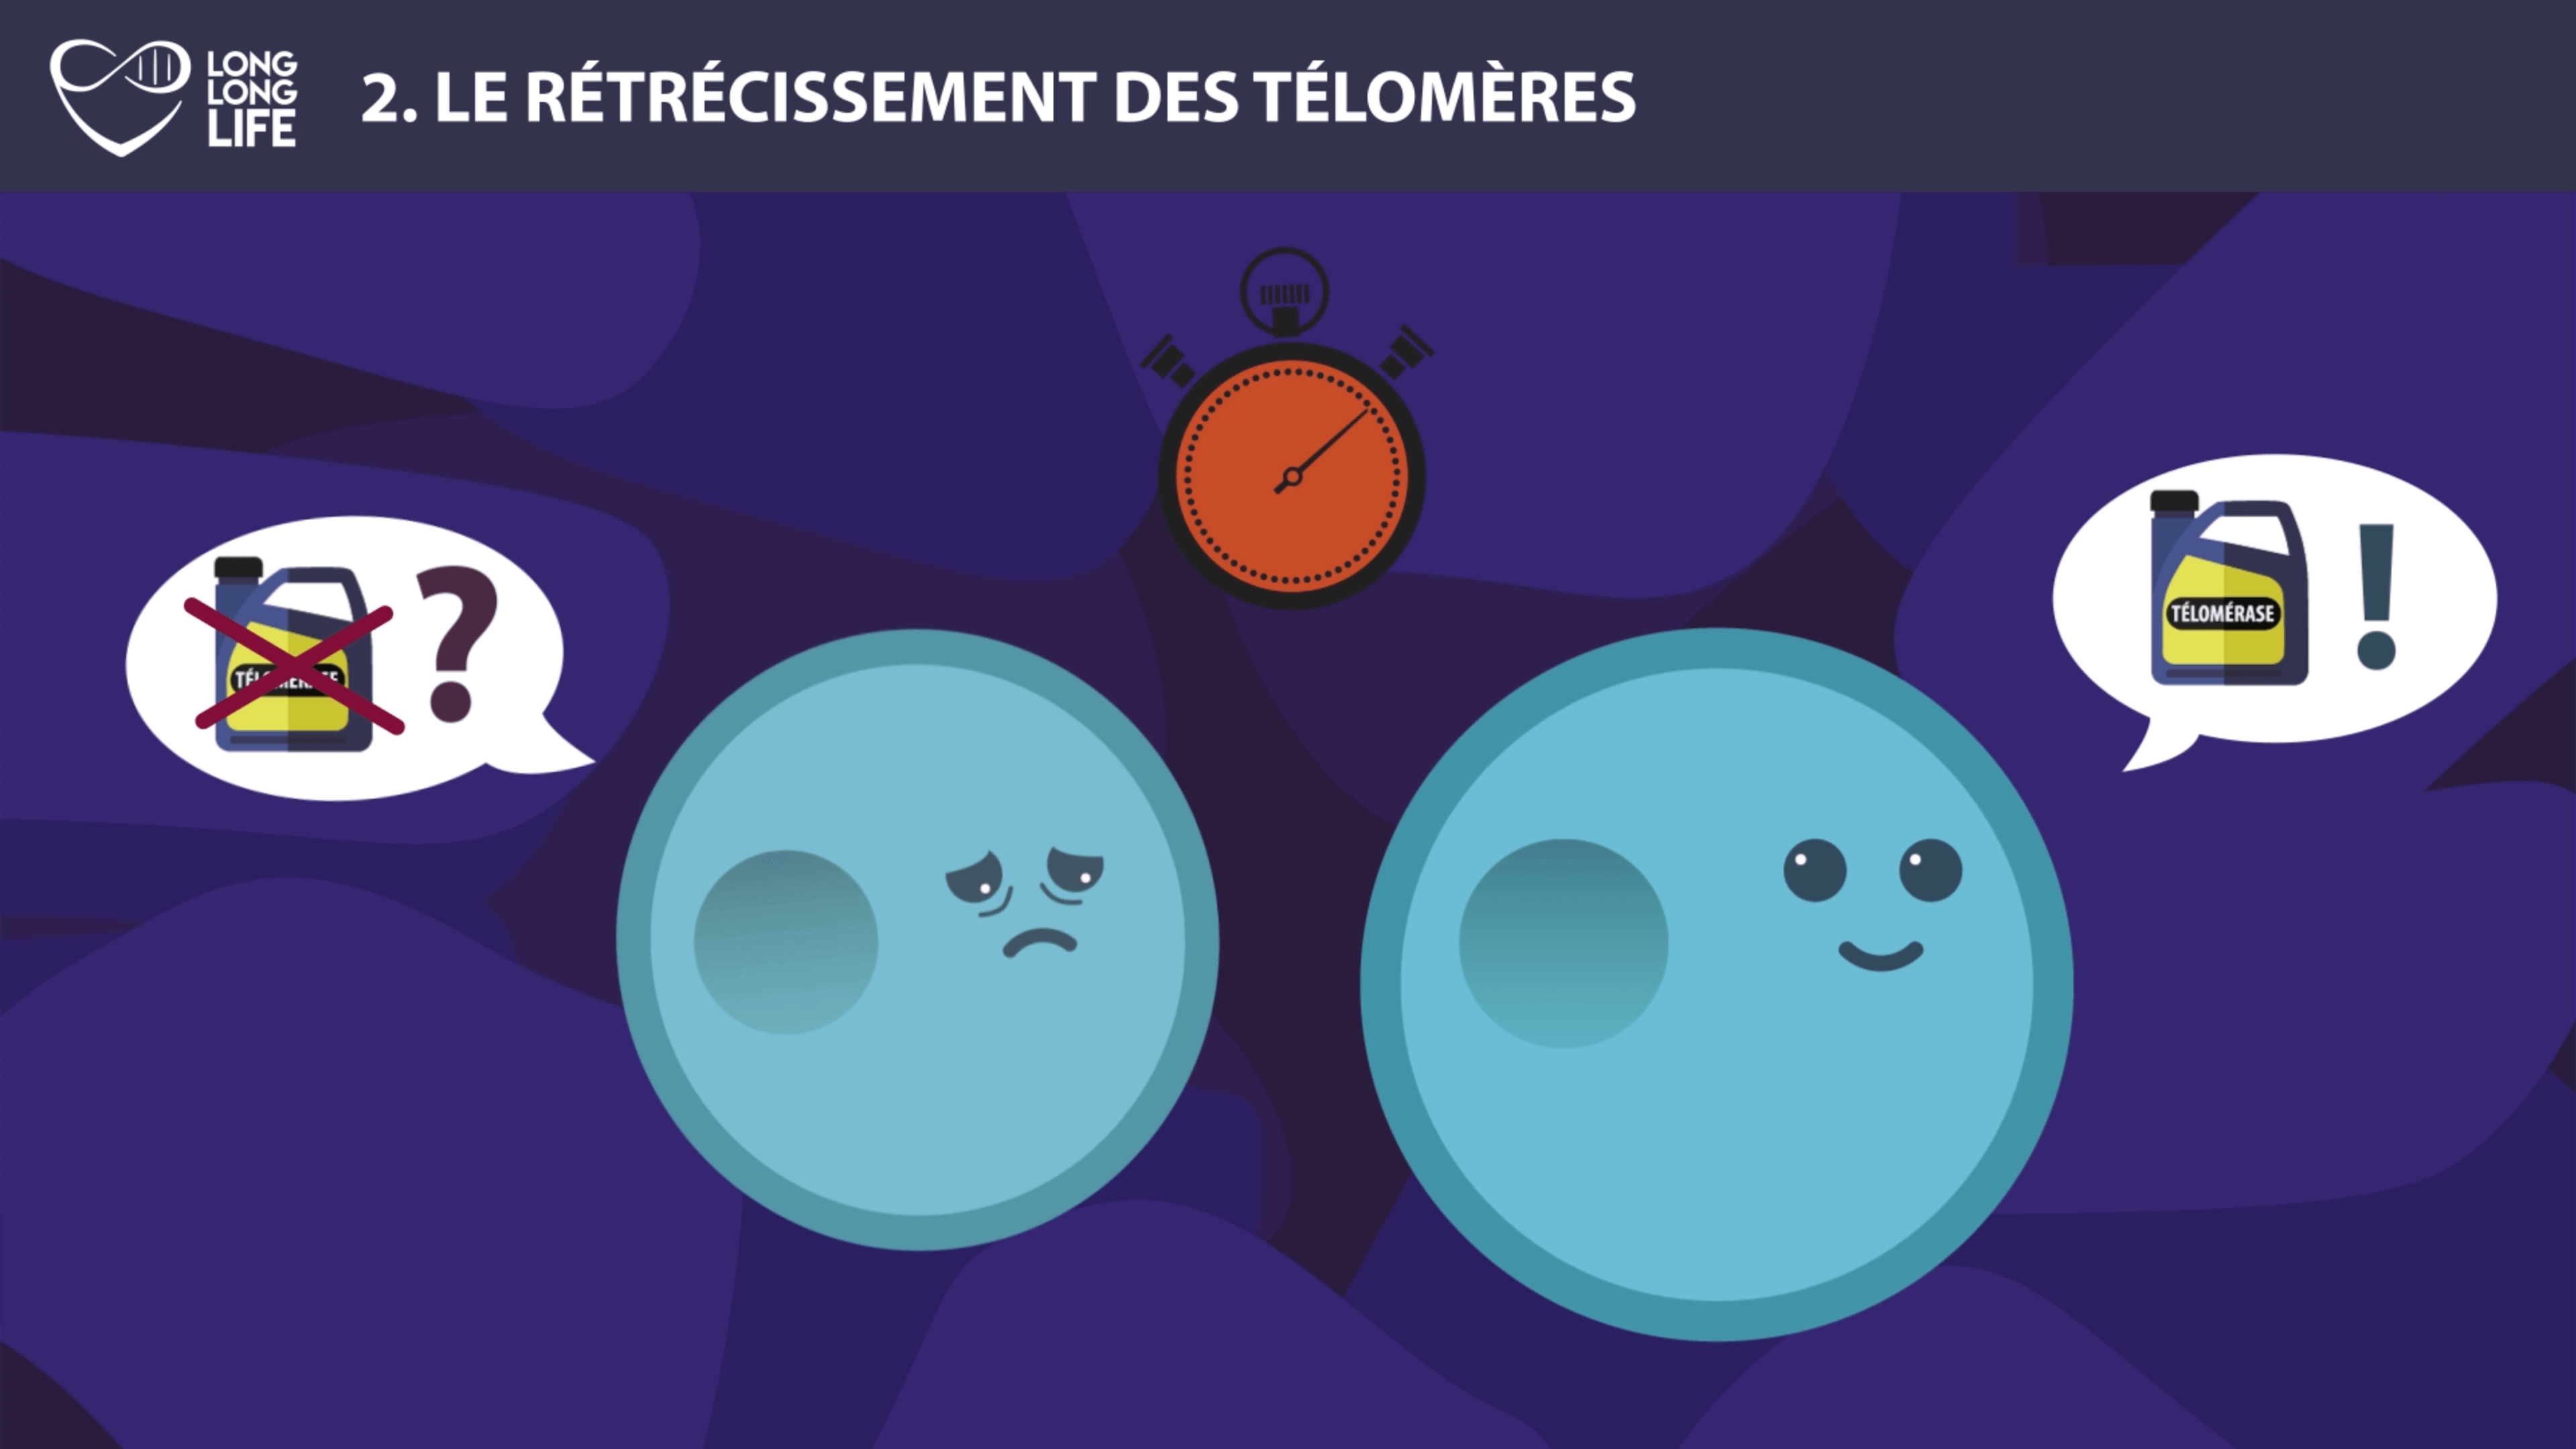 telomerase 2-Long-Long-Life-9-hallmarks of aging longevity transhumanism